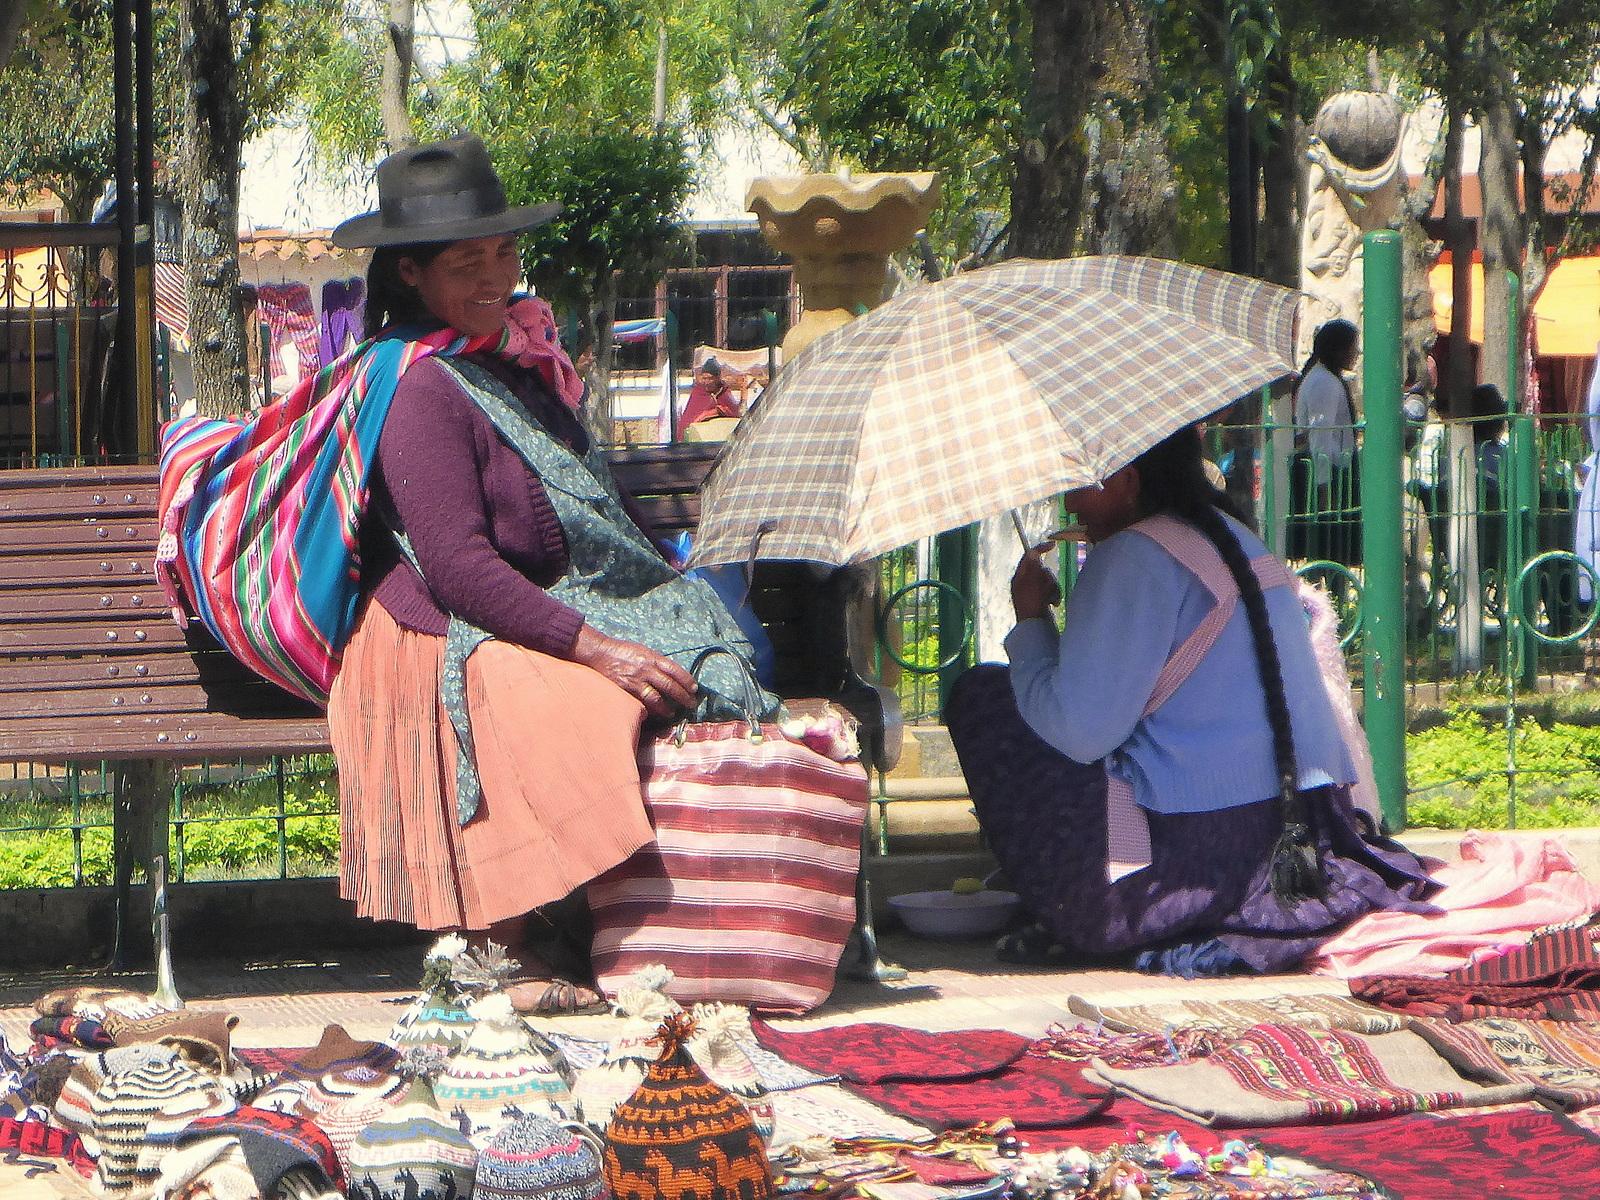 Marktfrauen